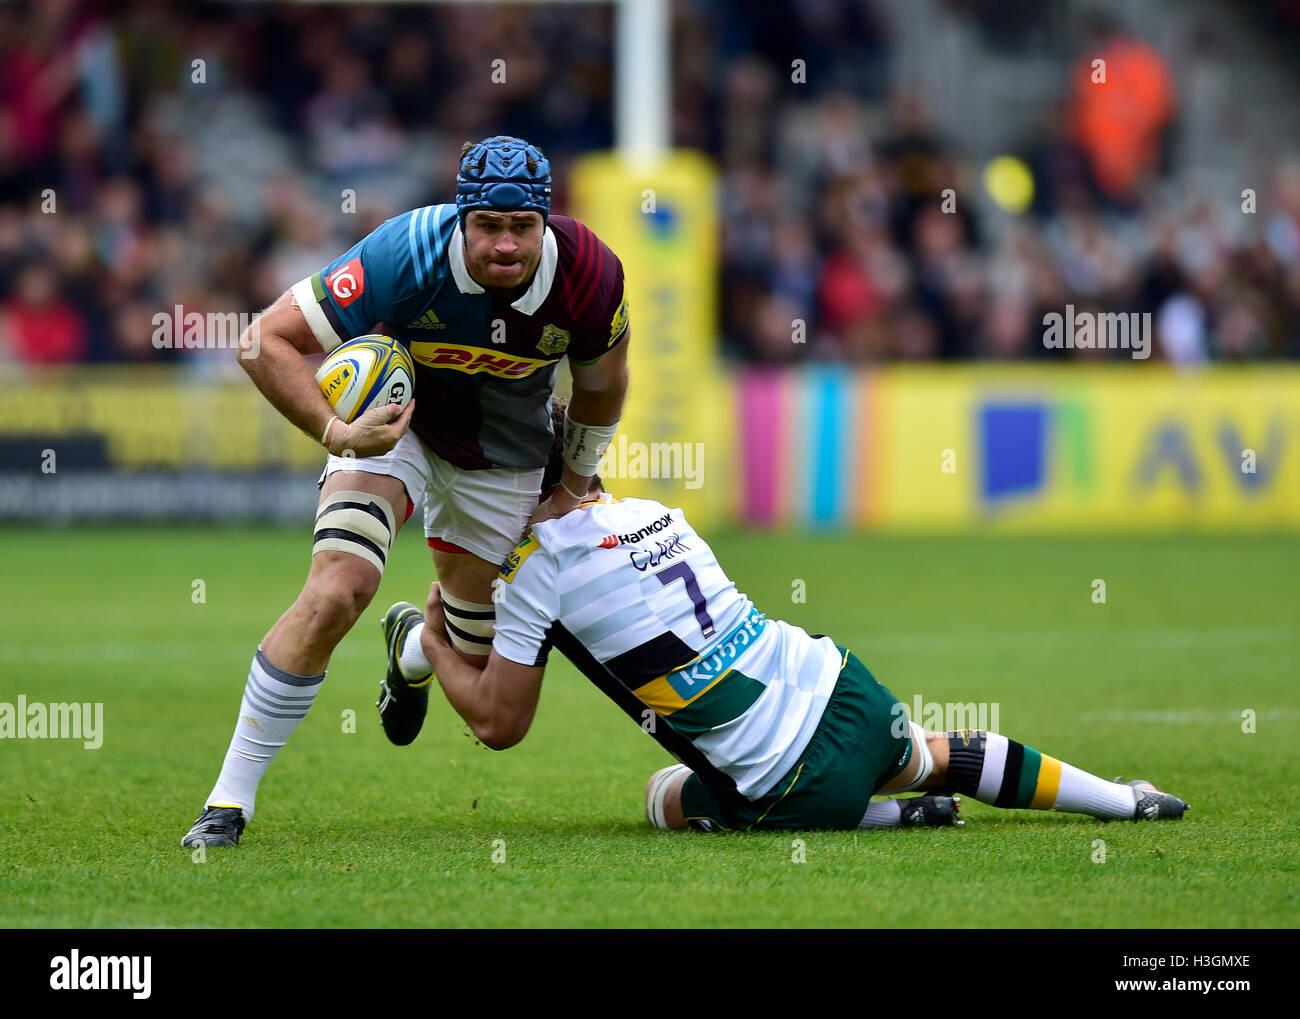 London, UK. 8. Oktober 2016. James Horwill (c) der Harlequins wurde während der Aviva Premiership Rugby-Spiel Stockbild